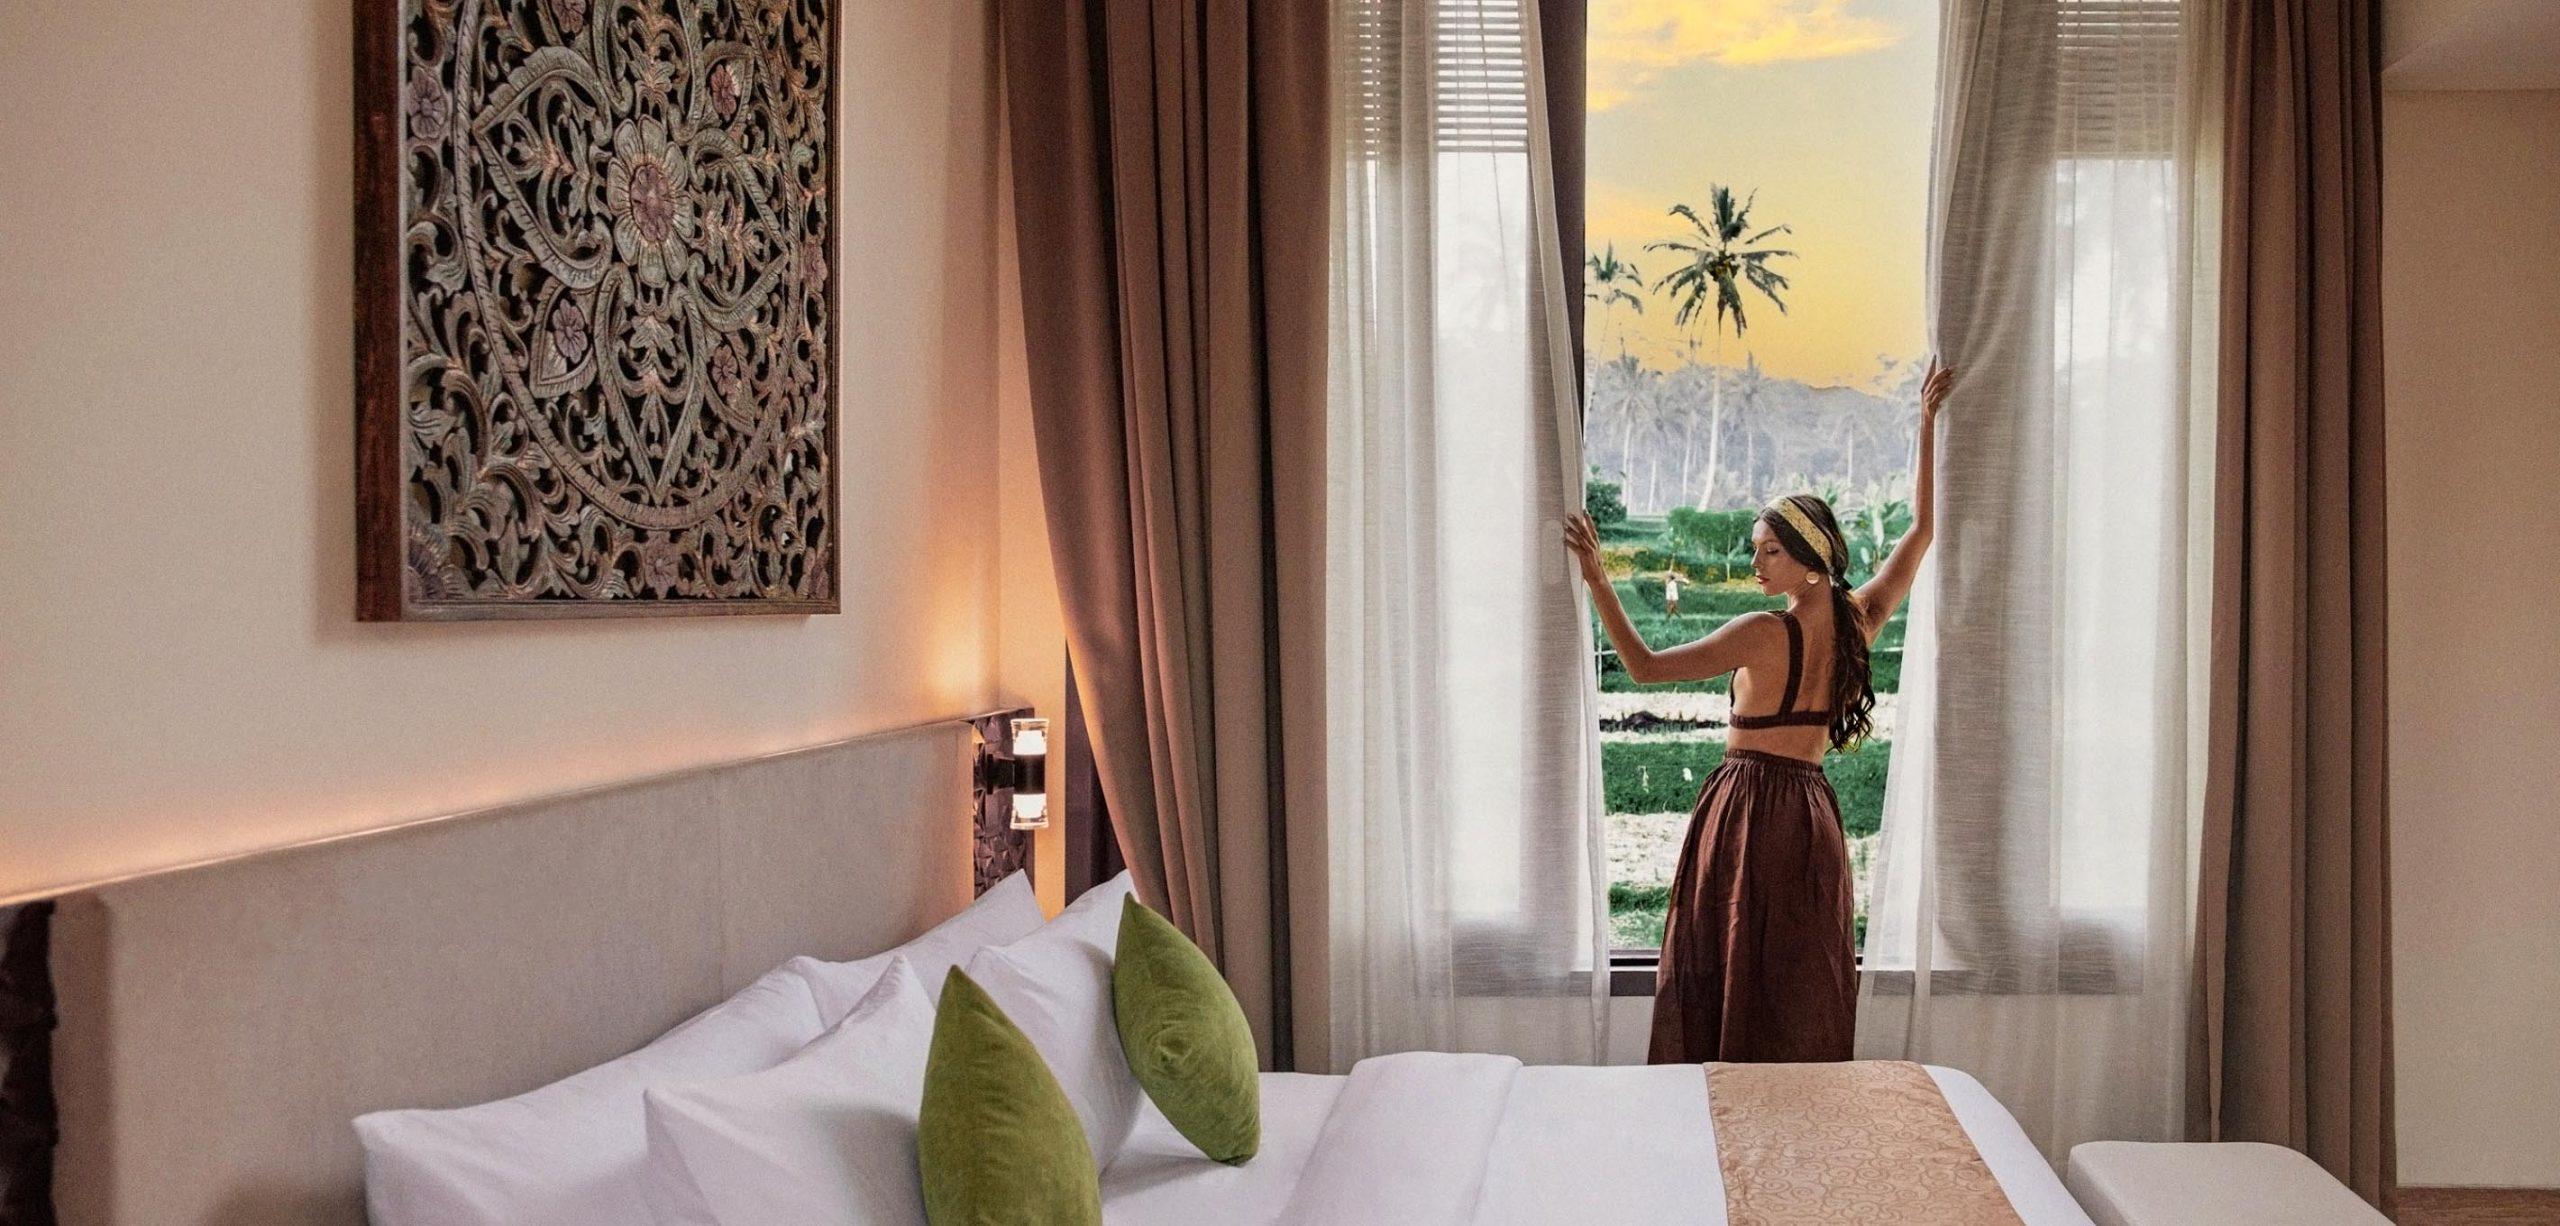 Single Bedroom welcomes views of Sunrise